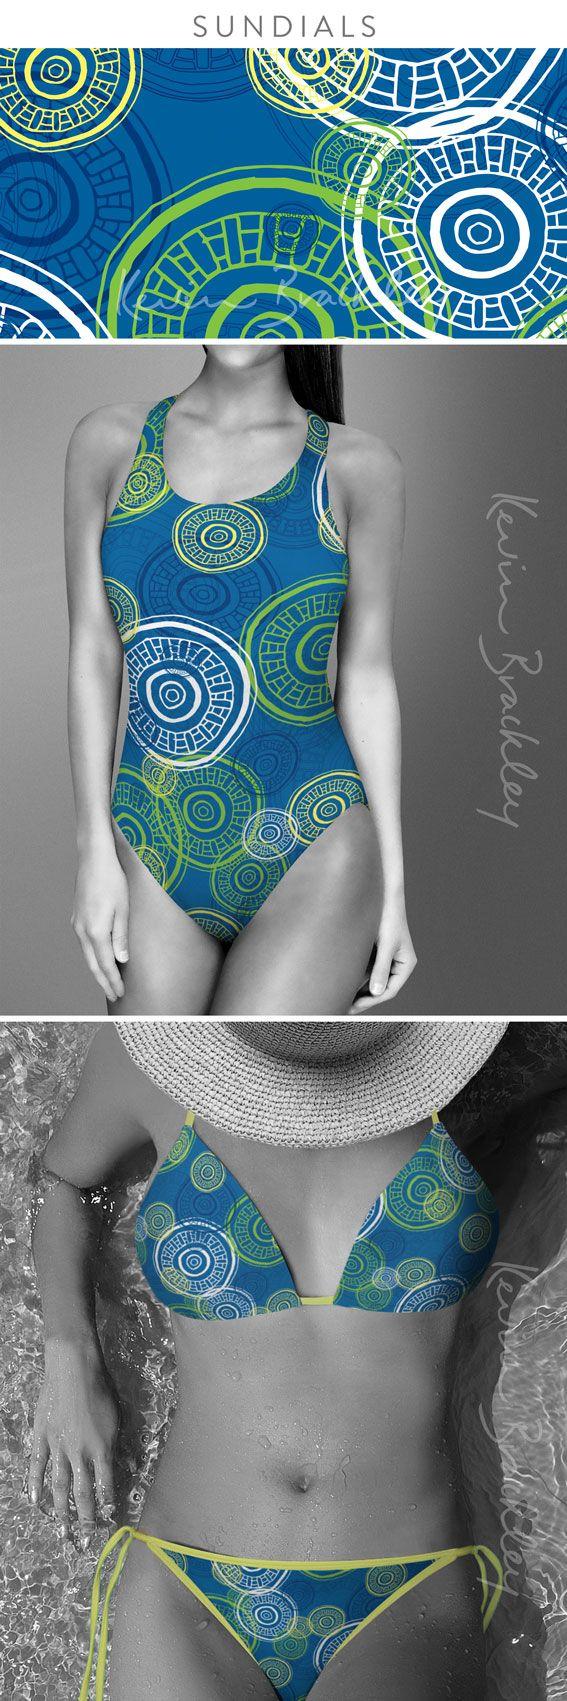 Women's swimwear concepts in my Sundials design